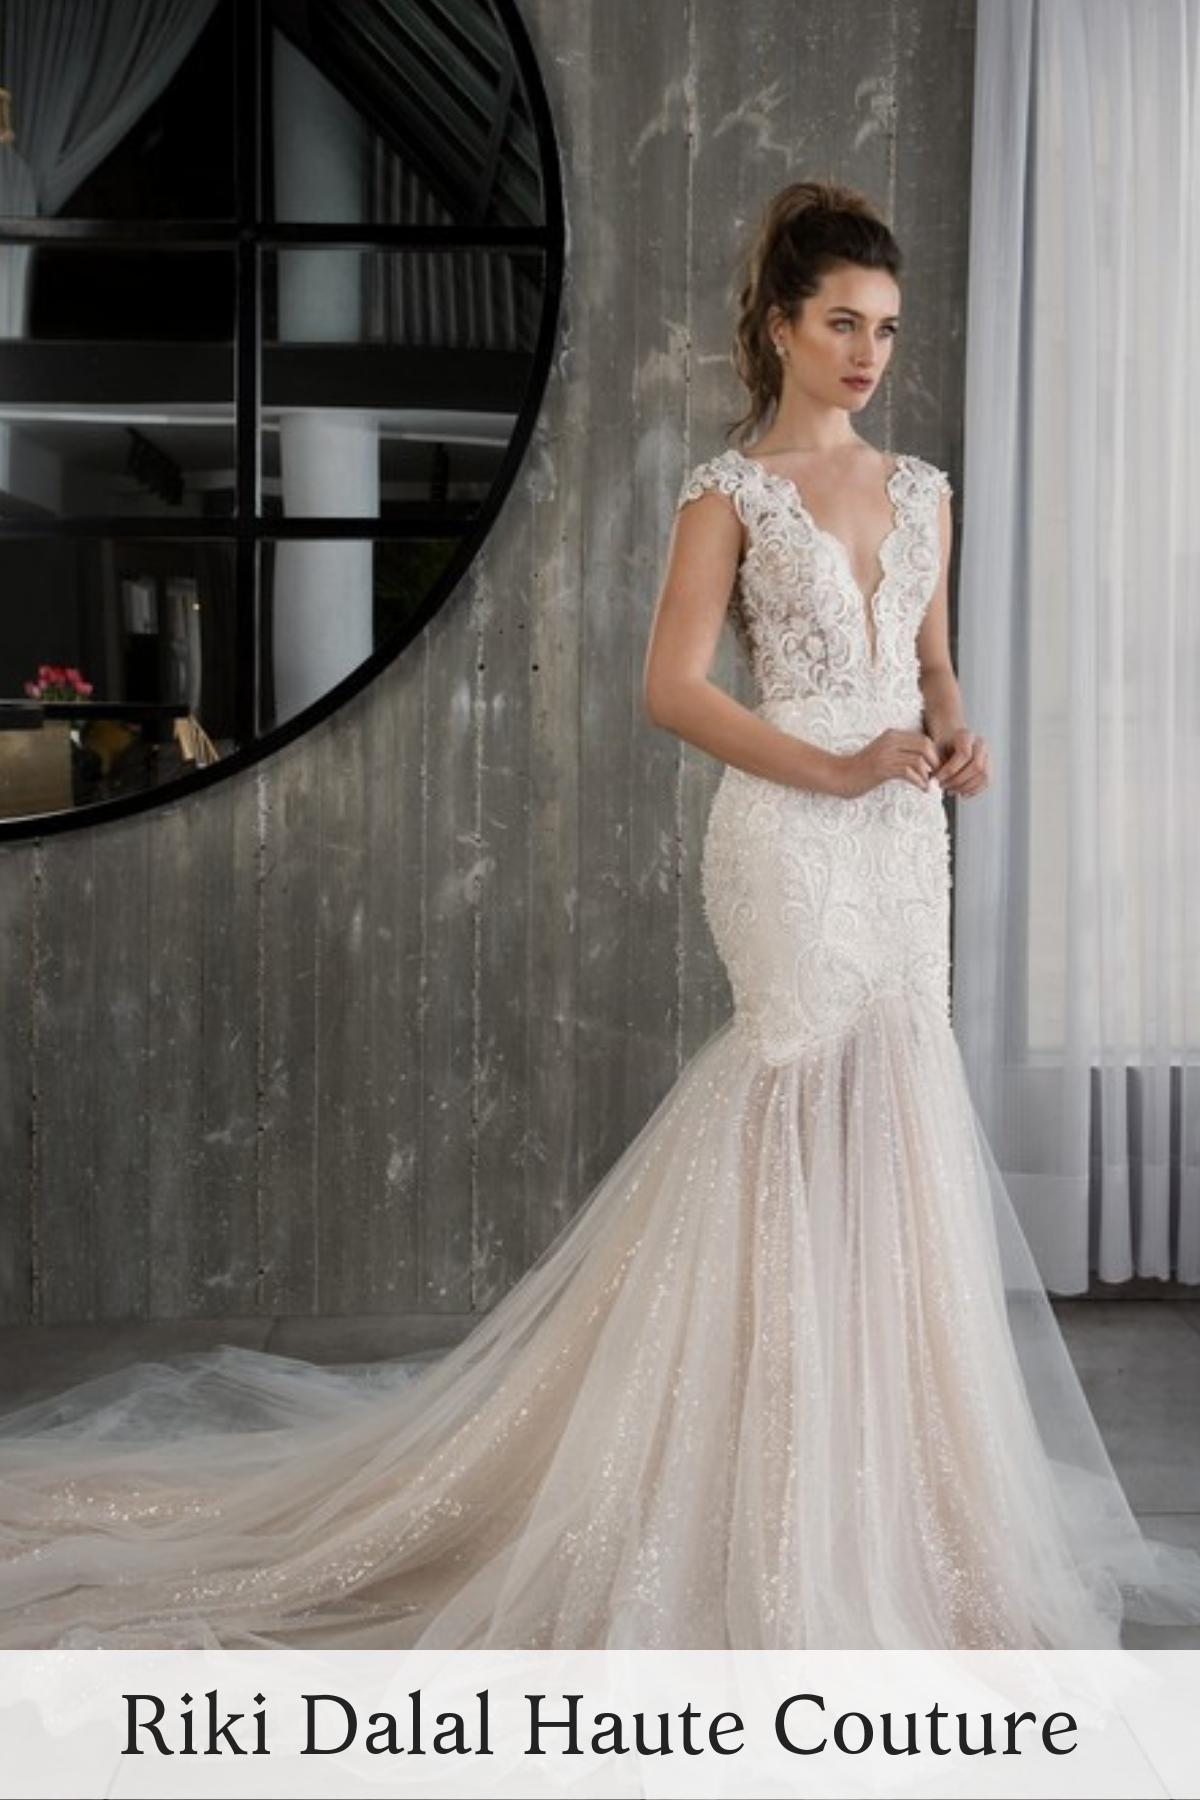 Riki Dalal Haute Couture